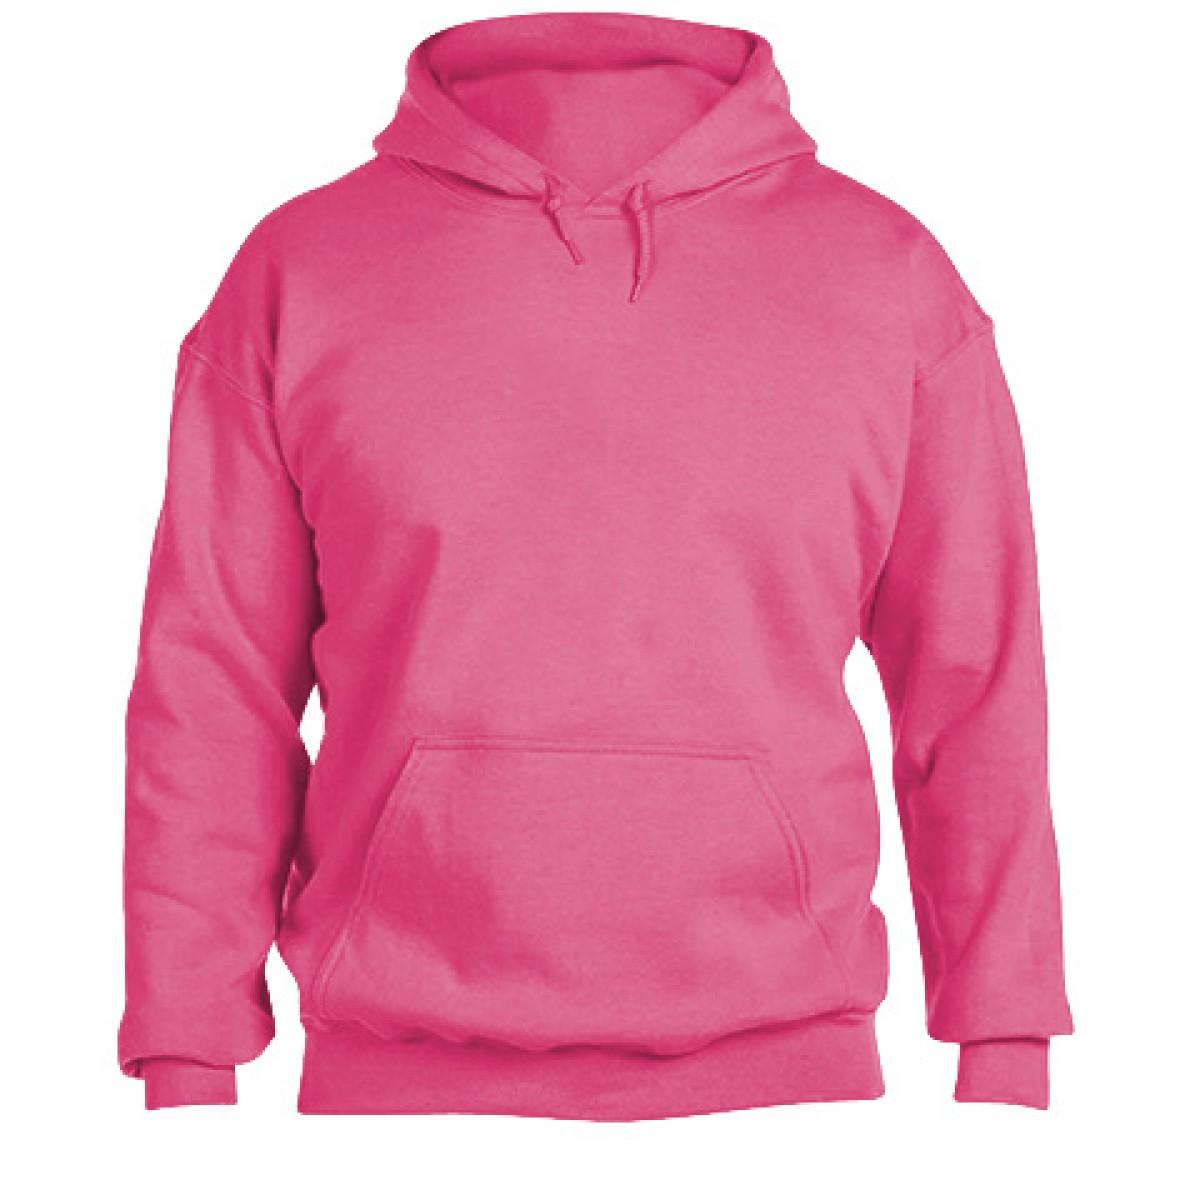 Hooded Sweatshirt 50/50 Heavy Blend -Safety Pink-L